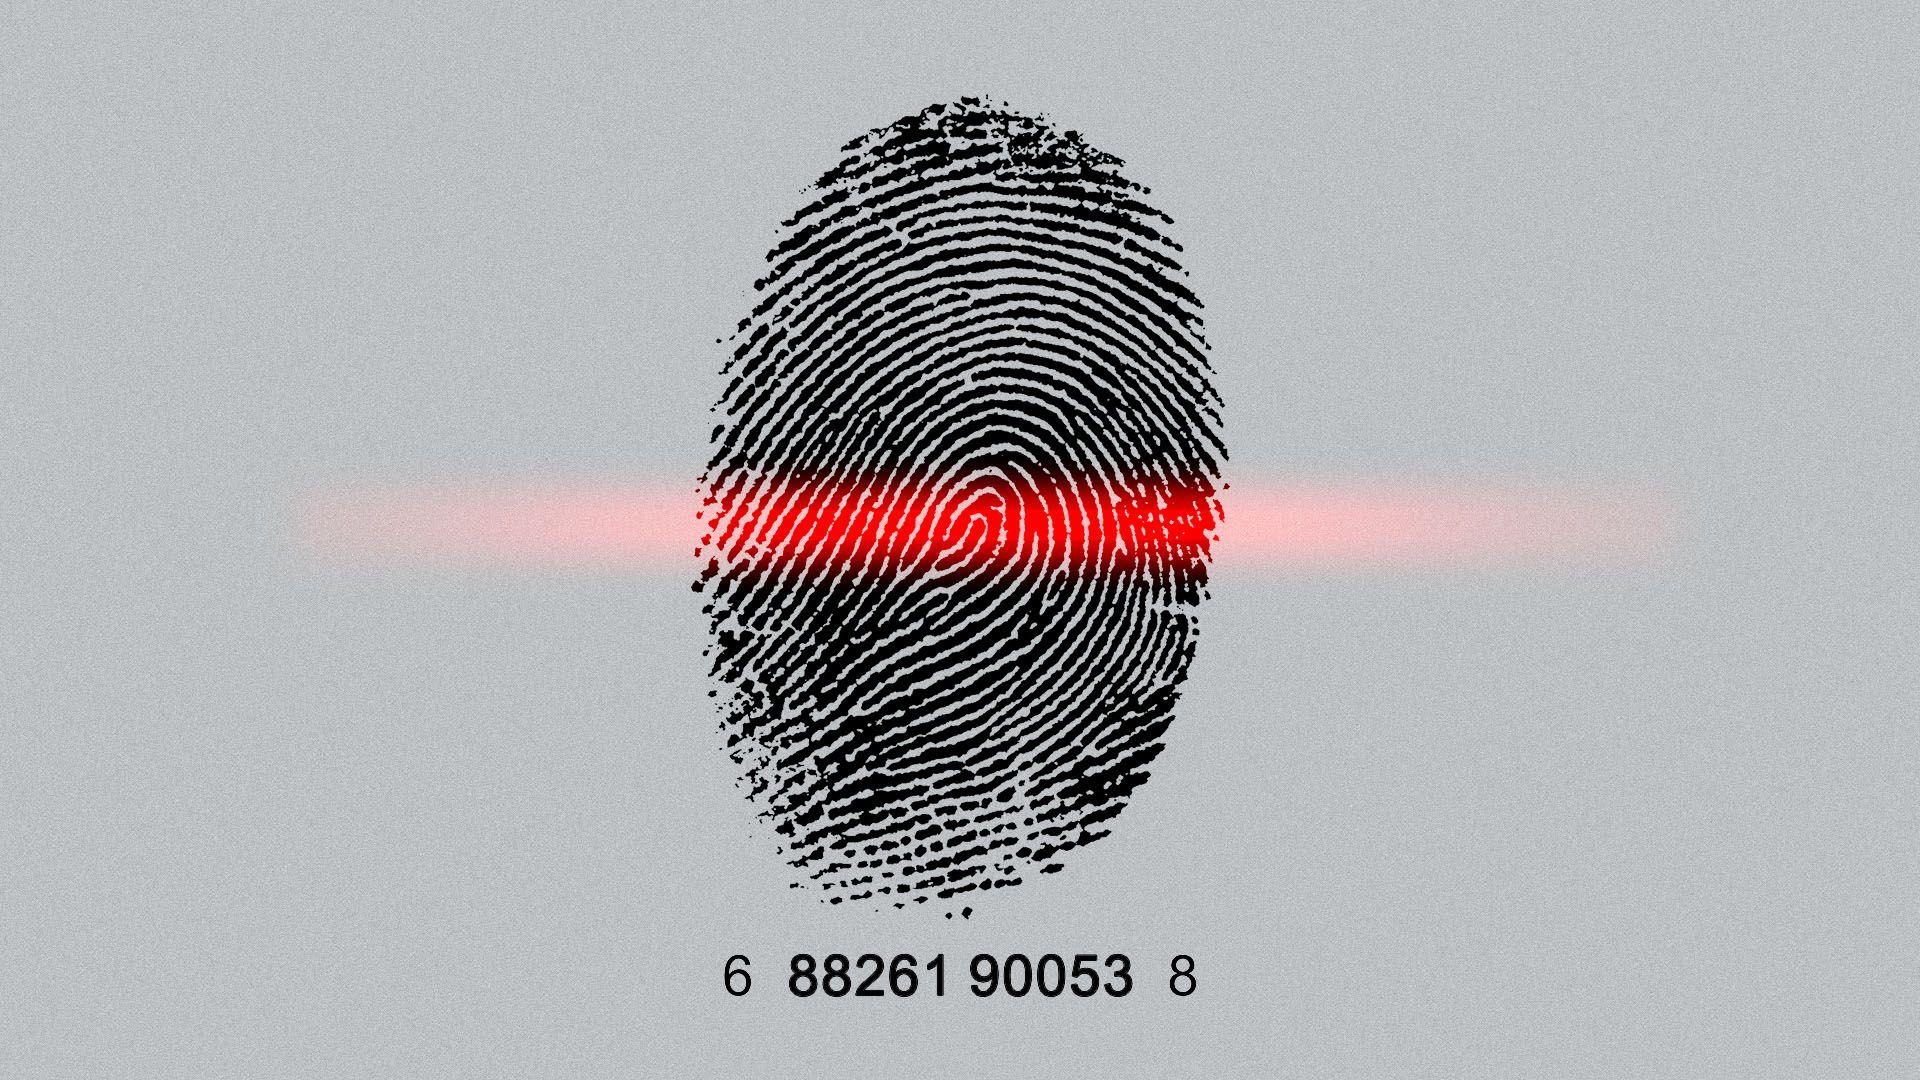 Illustration of a fingerprint as a barcode